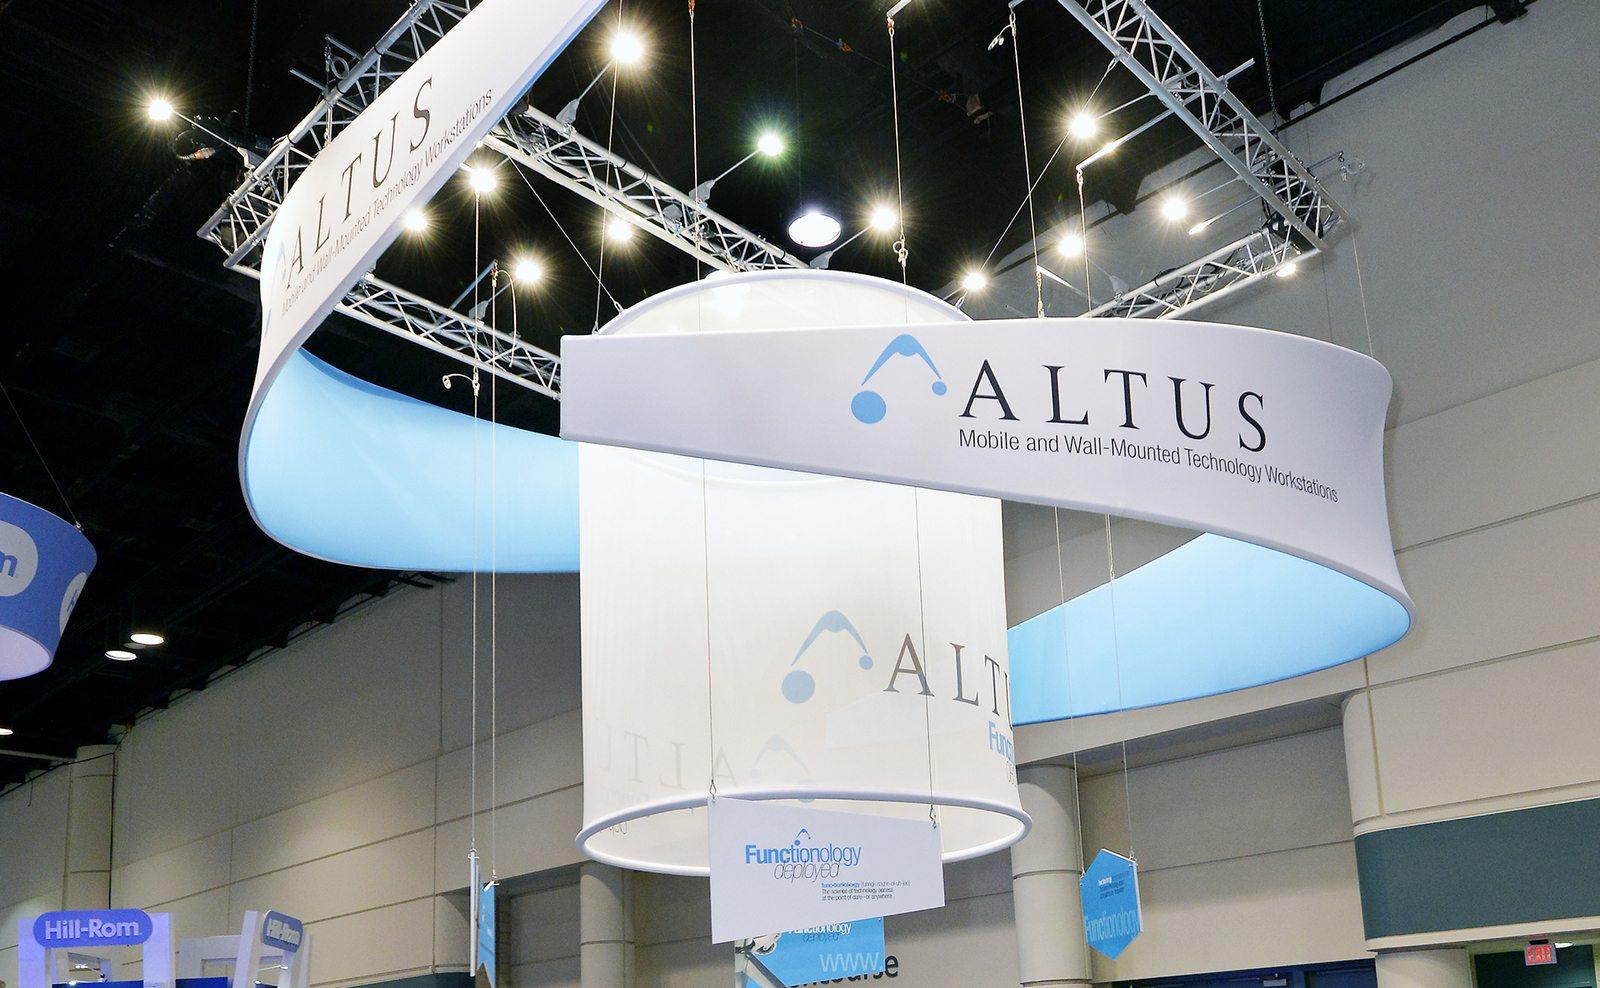 Altus_hanging_sign 1